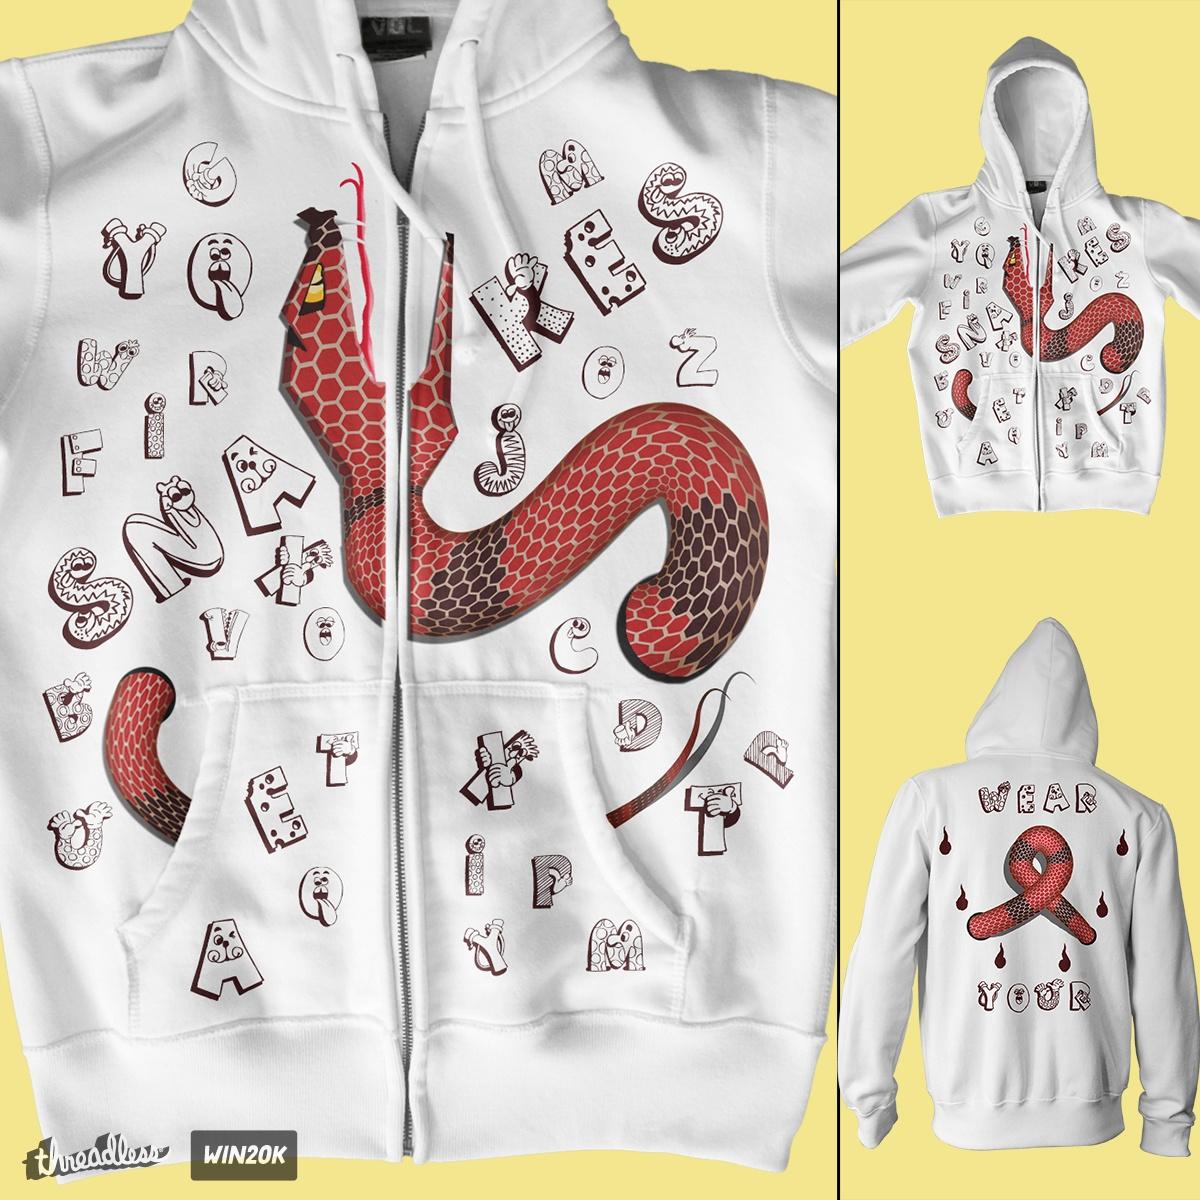 Wear It! by Engico on Threadless